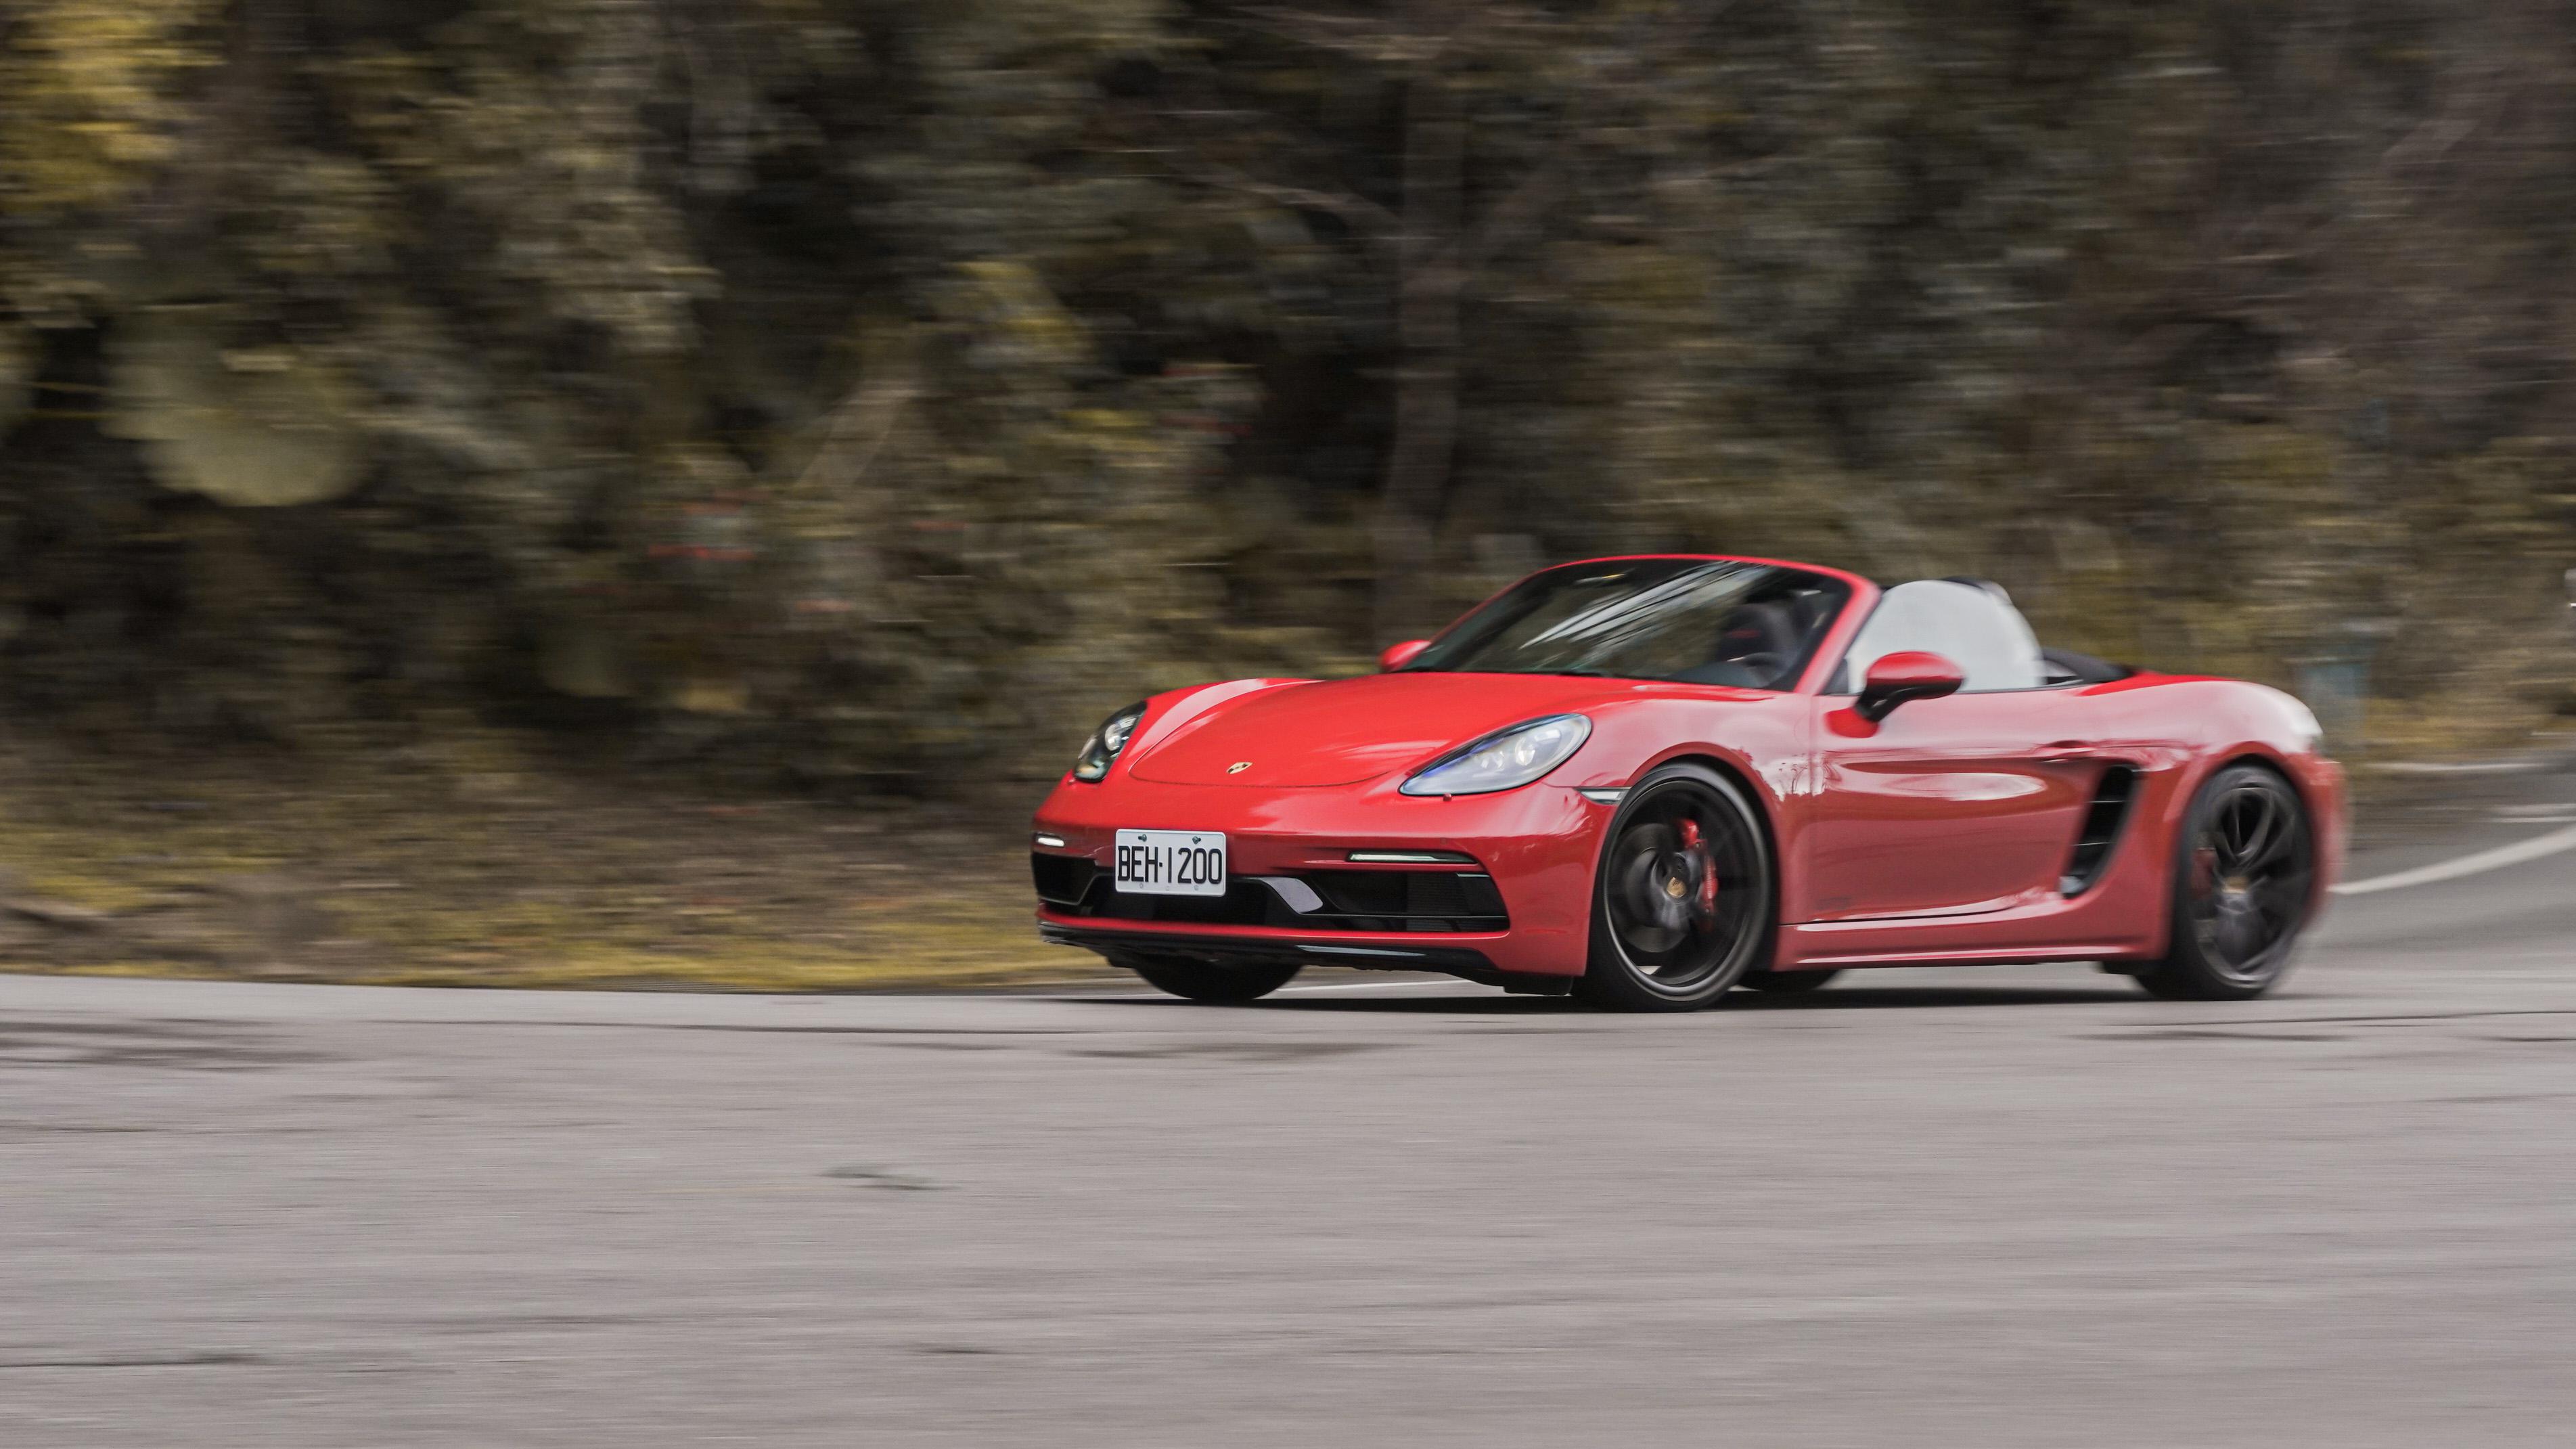 Porsche 718 Boxster GTS 不只拉風,還給你壯遊的感動